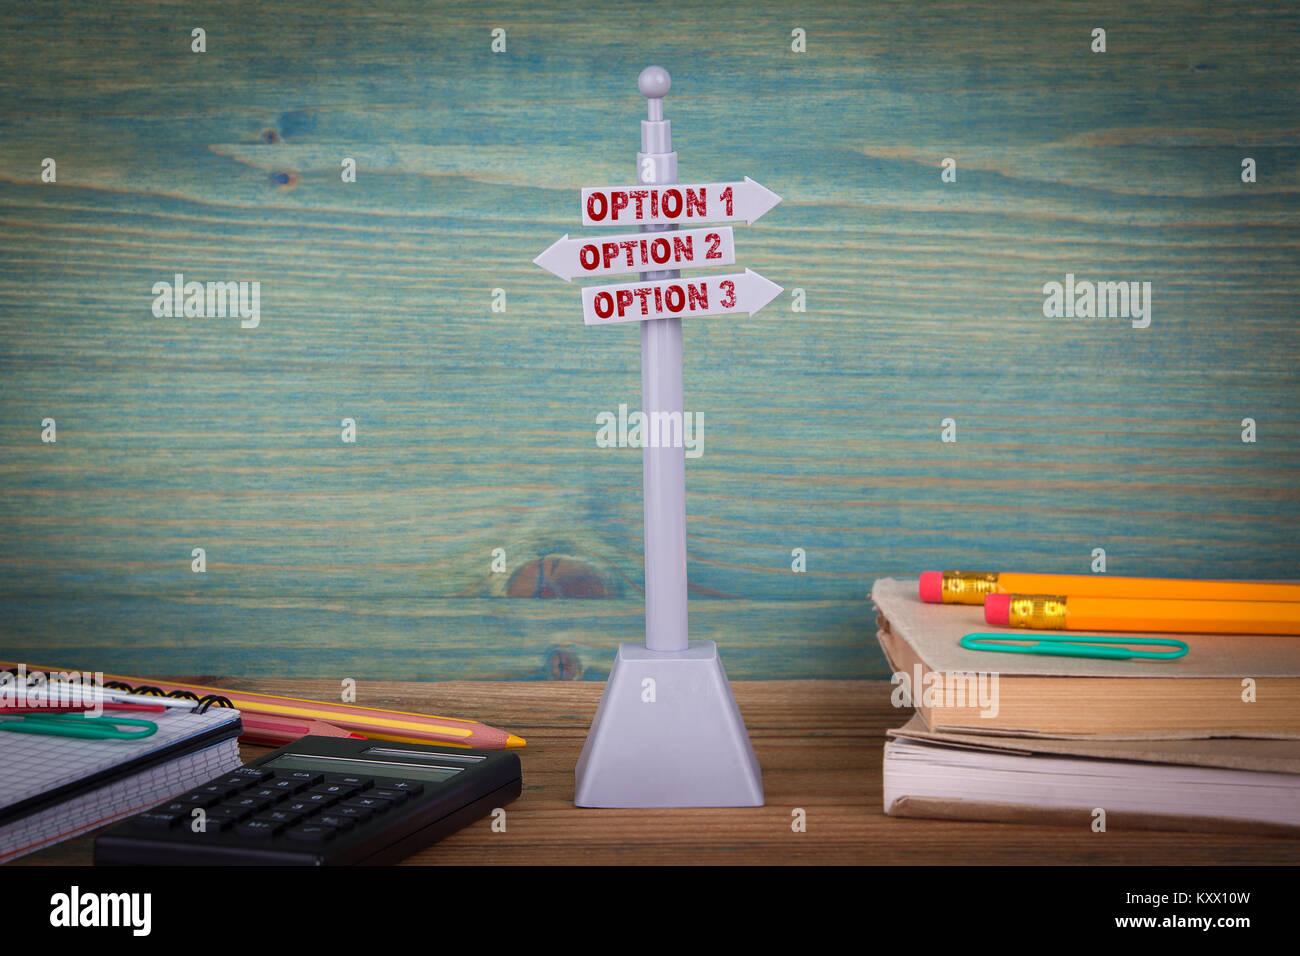 option 1, option 2, option 3. Signpost on wooden table - Stock Image